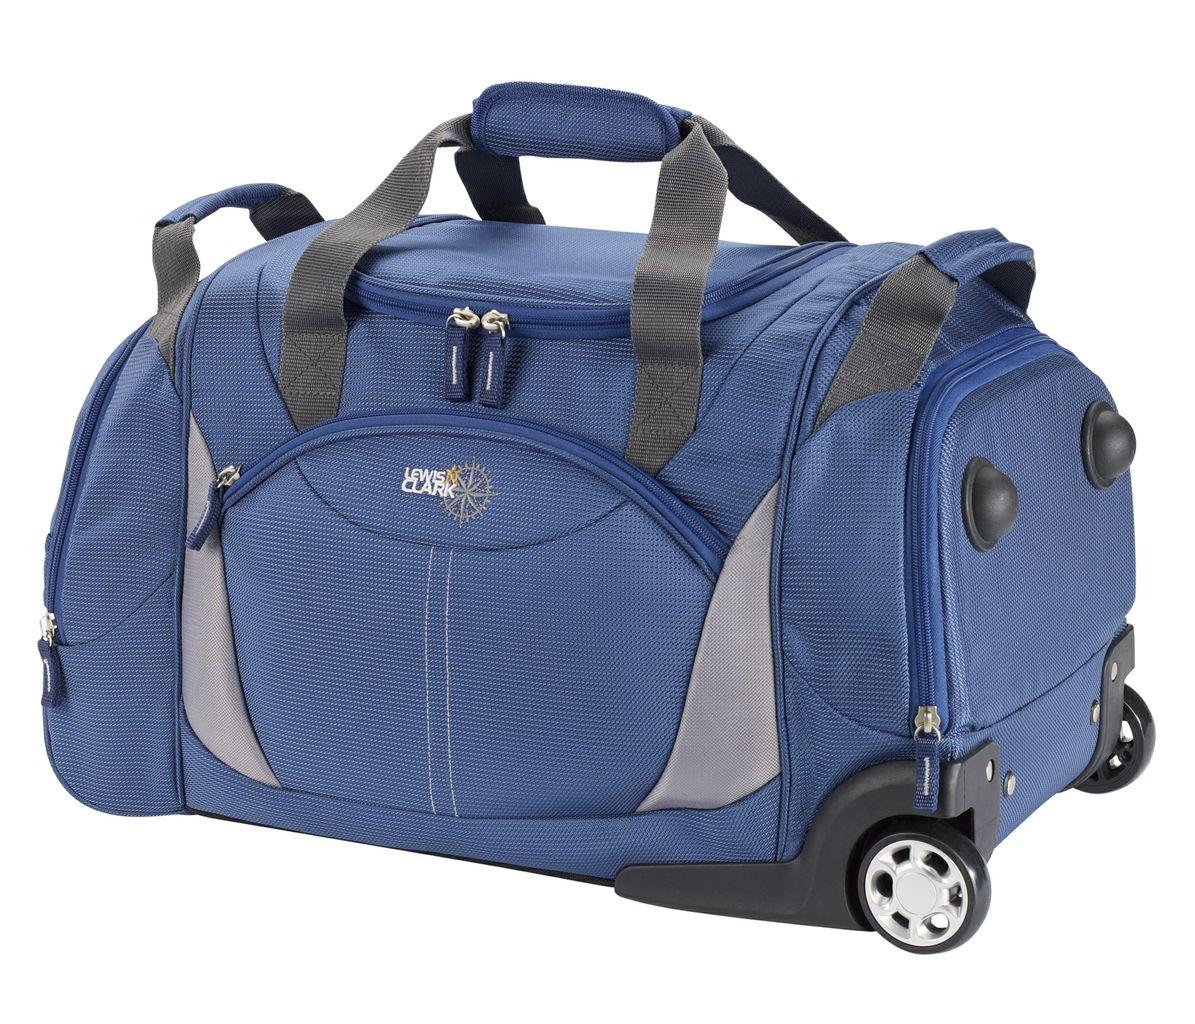 Lewis N Clark 22in Wheeled Duffel Blue